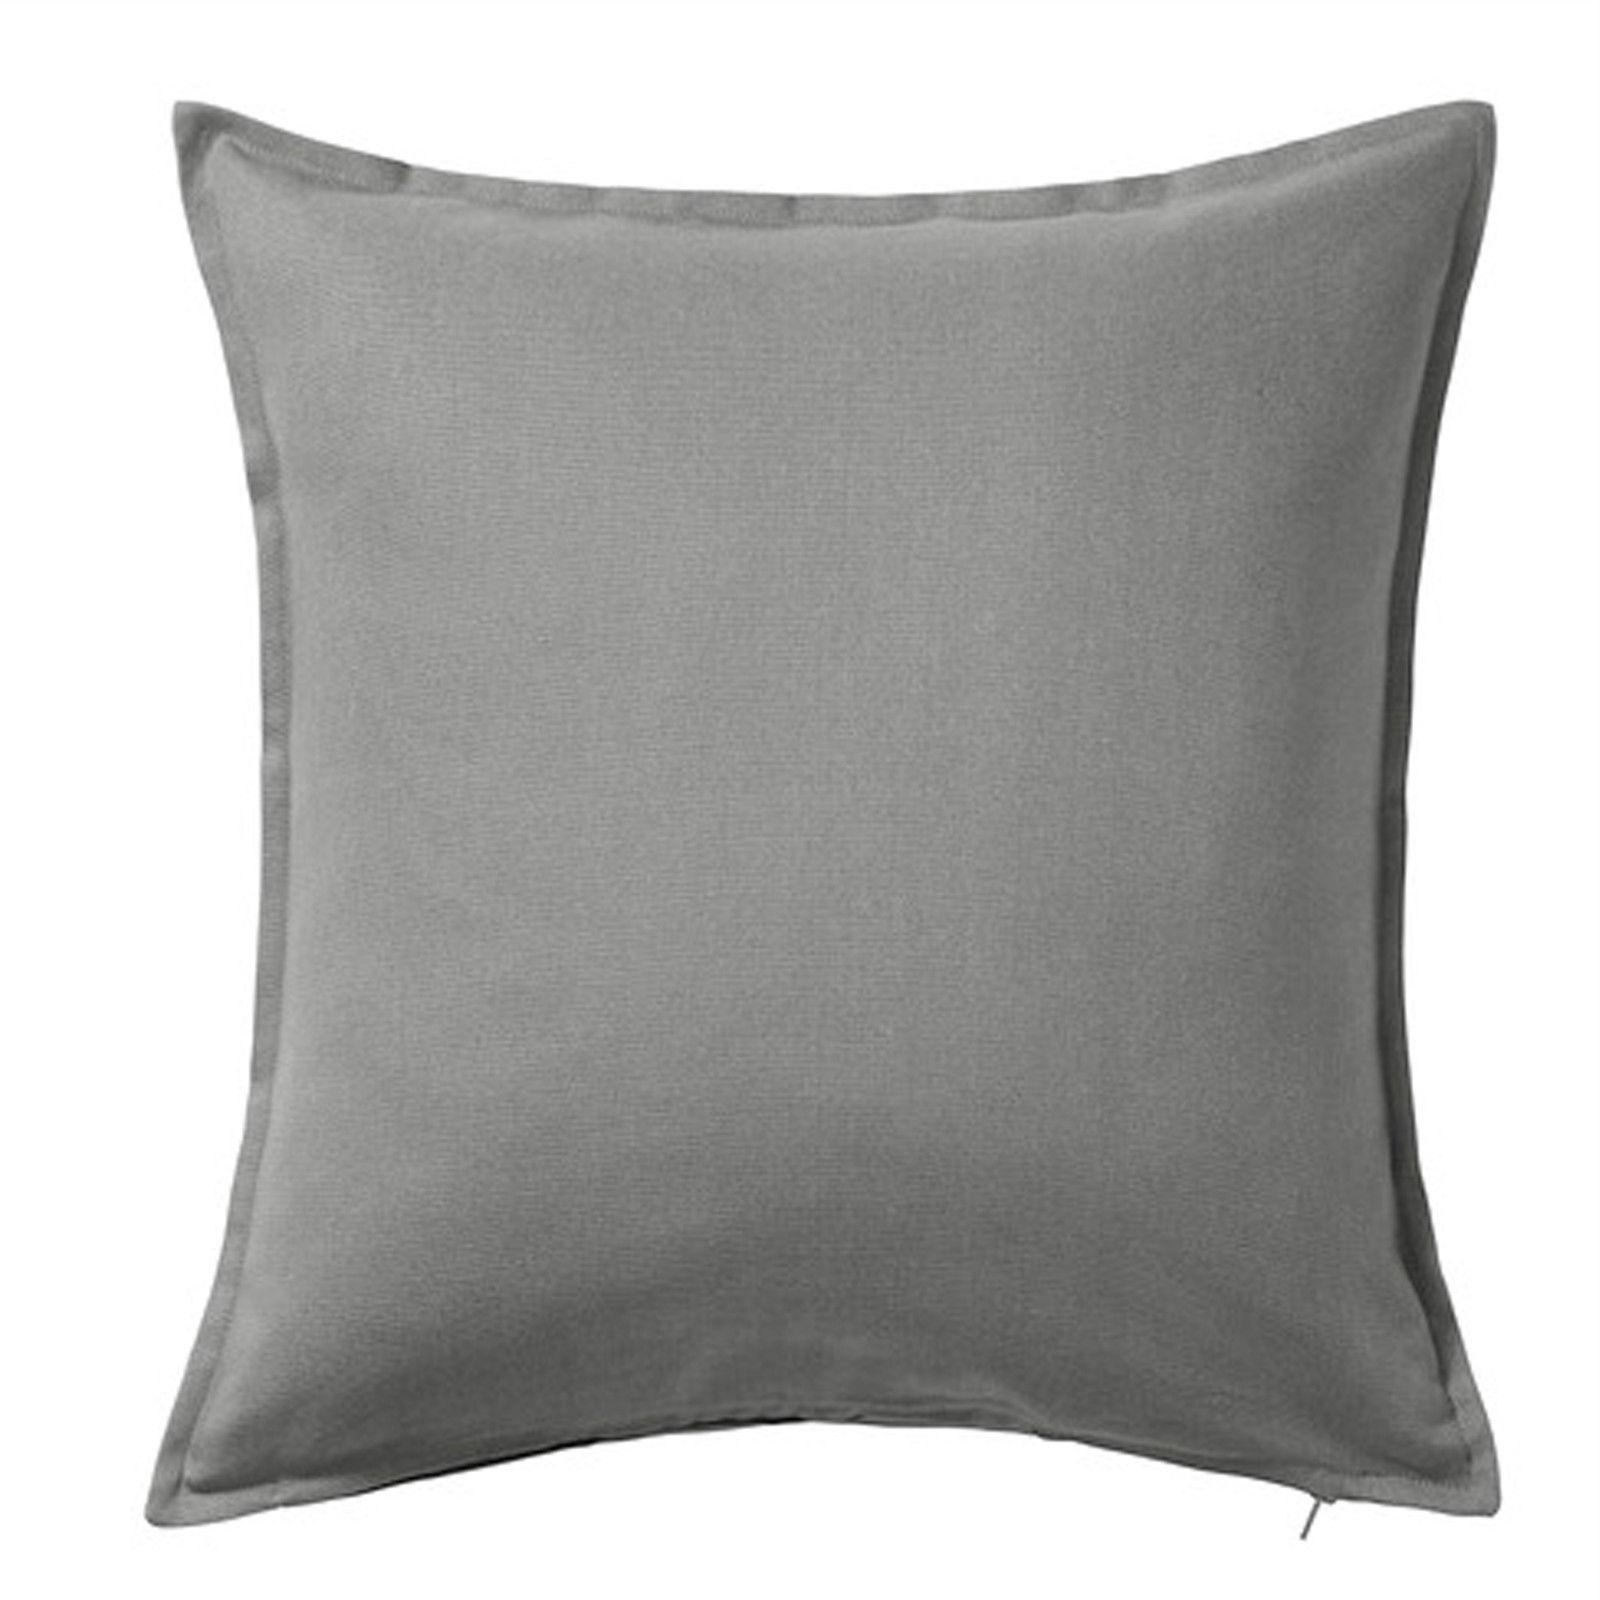 Bettwaren Wäsche Matratzen Ikea Gurli Kissenbezug Kissenhülle